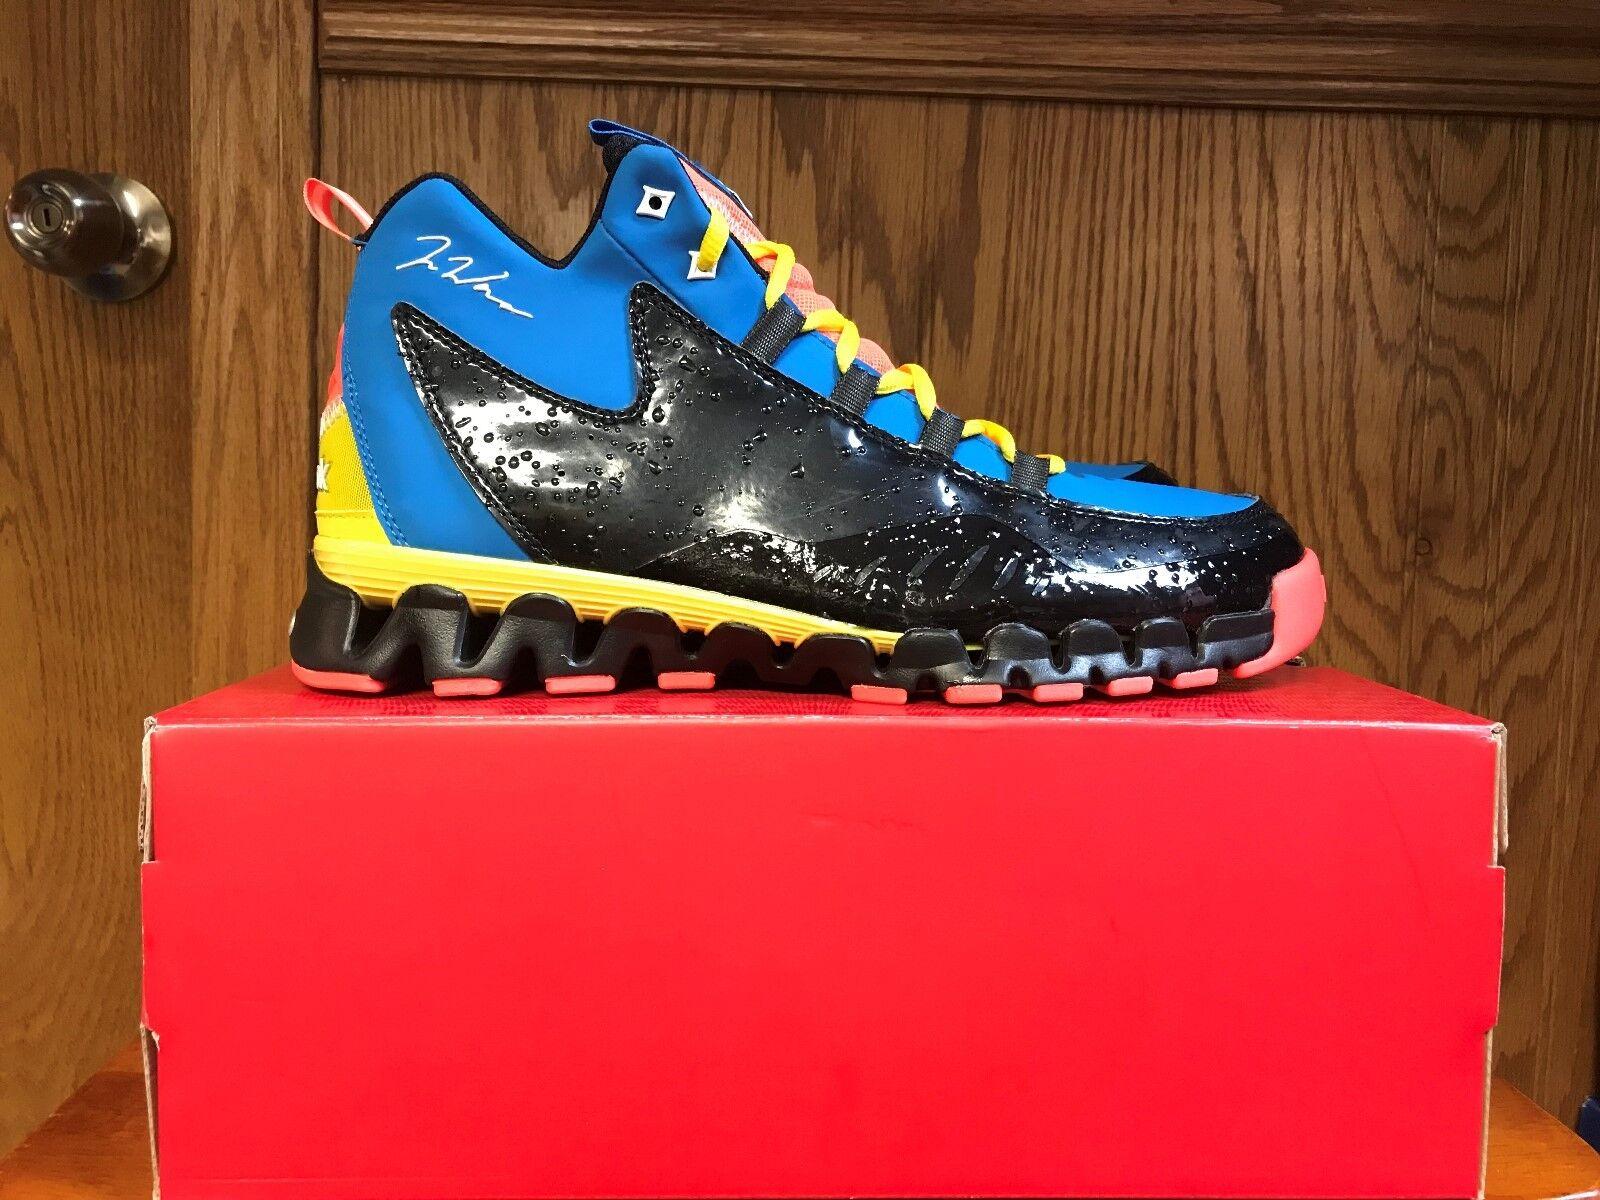 NIB Reebok Zigtech Wall Season 3 Zigescape Basketball Shoes Men's Size 10.5